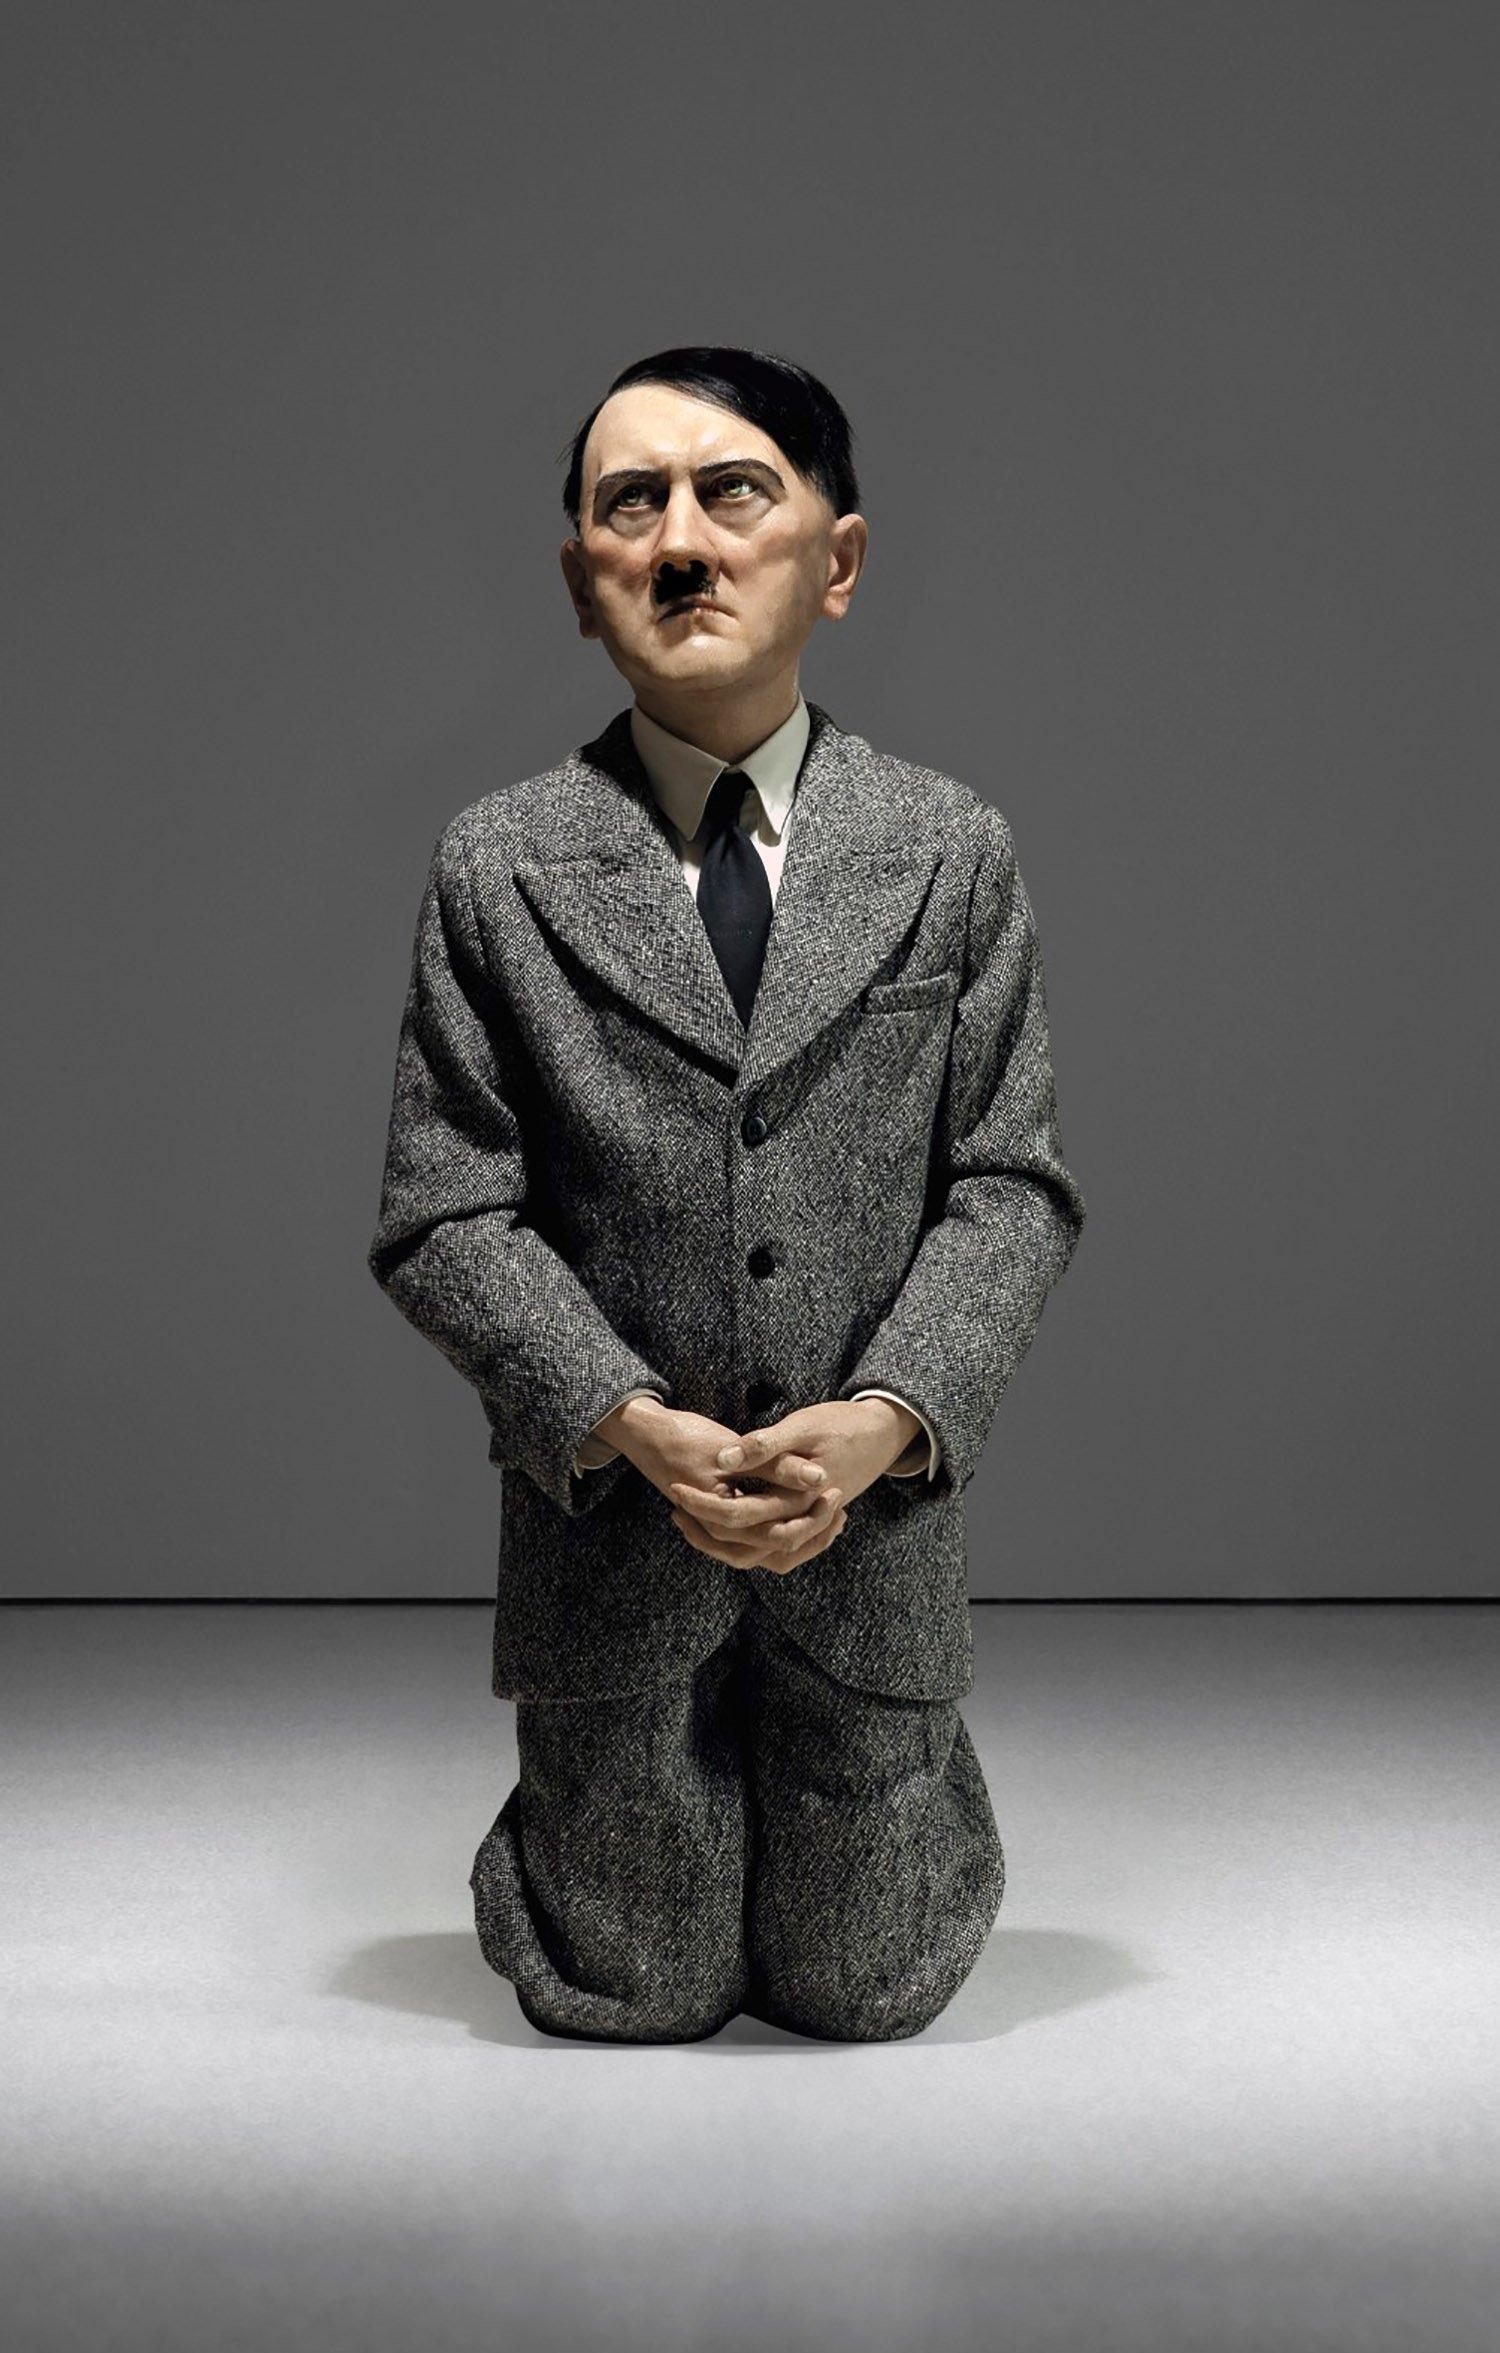 Kneeling Hitler statue sells for £12million at auction